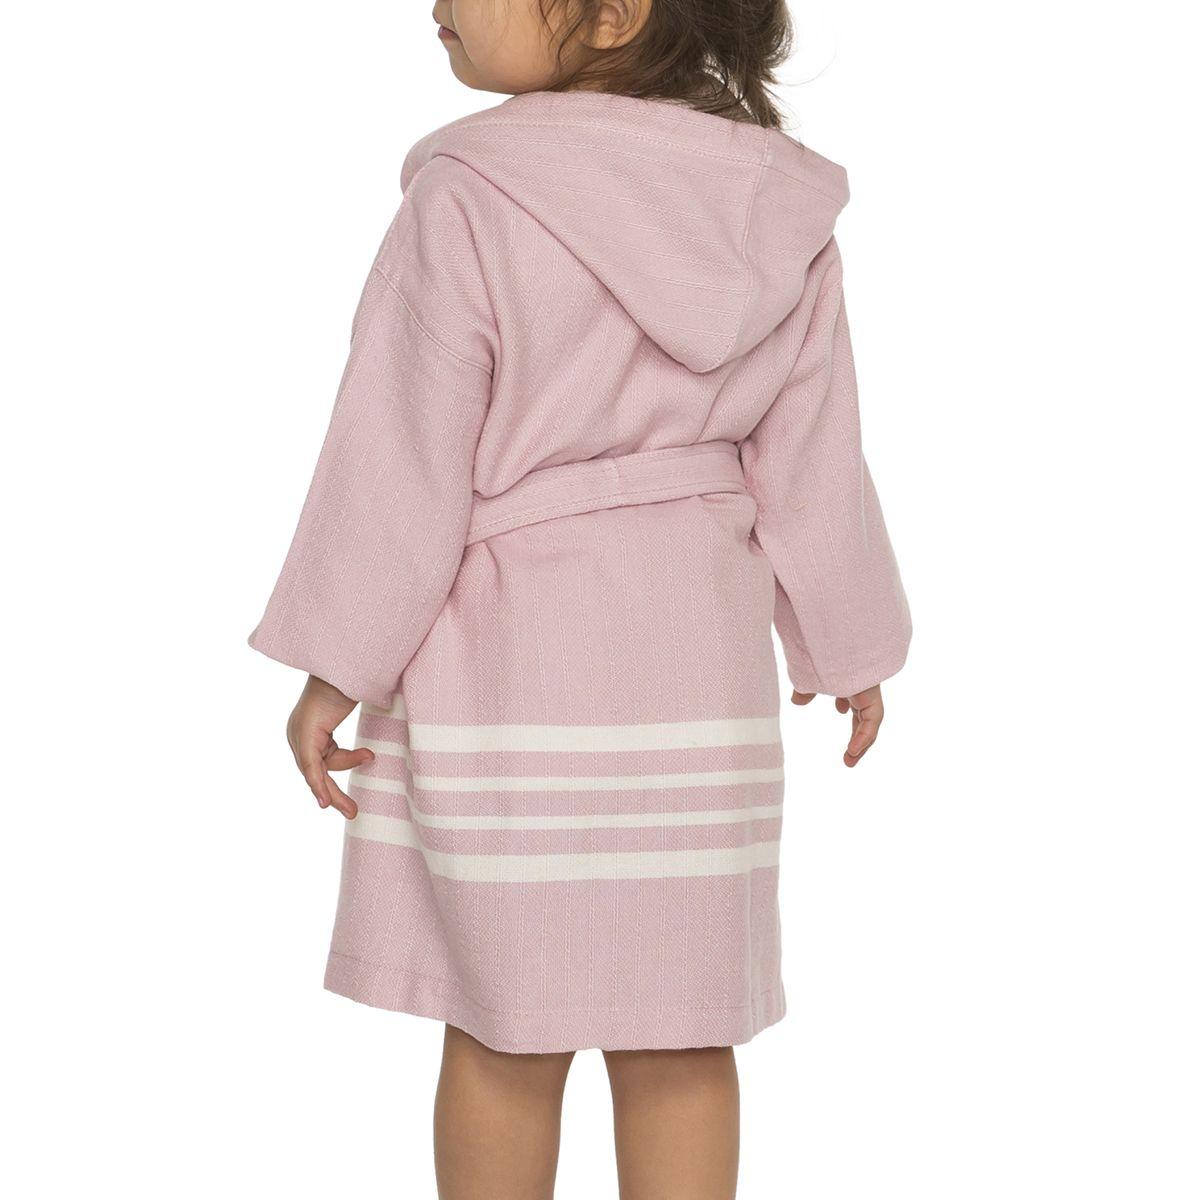 Bathrobe Kiddo with hood - Rose Pink